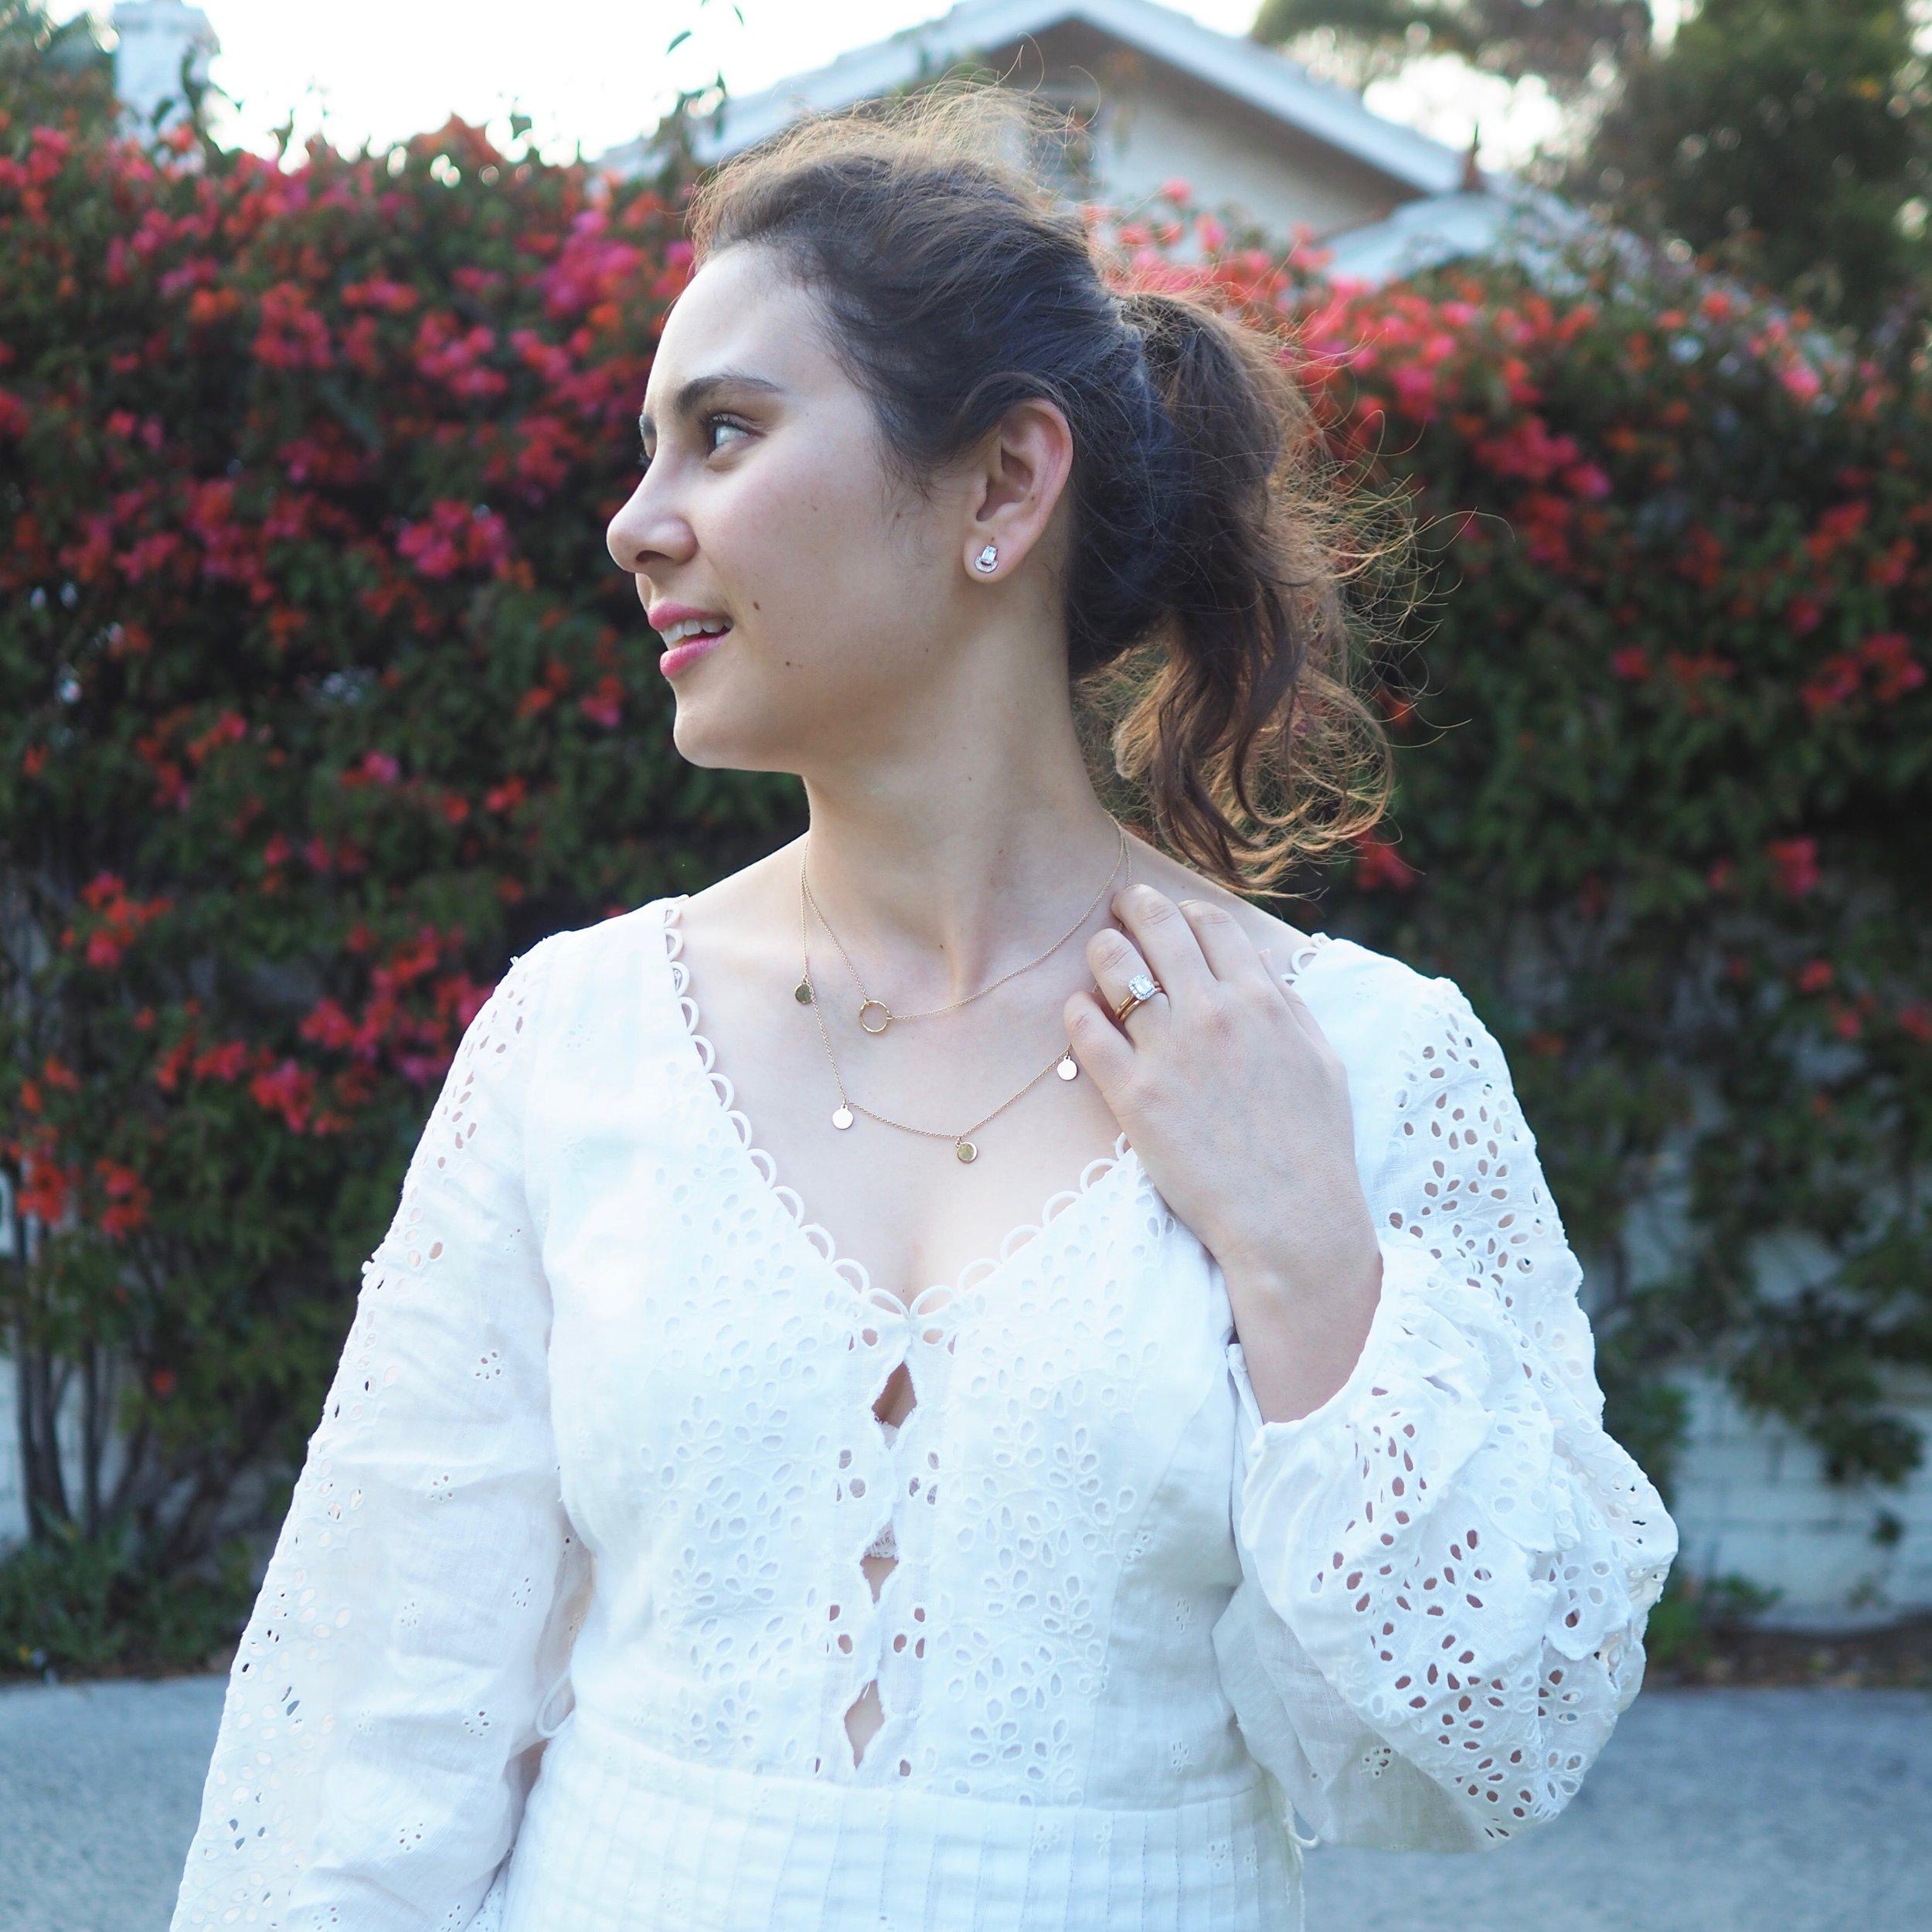 White Dress Leather JacketPA271543.jpeg